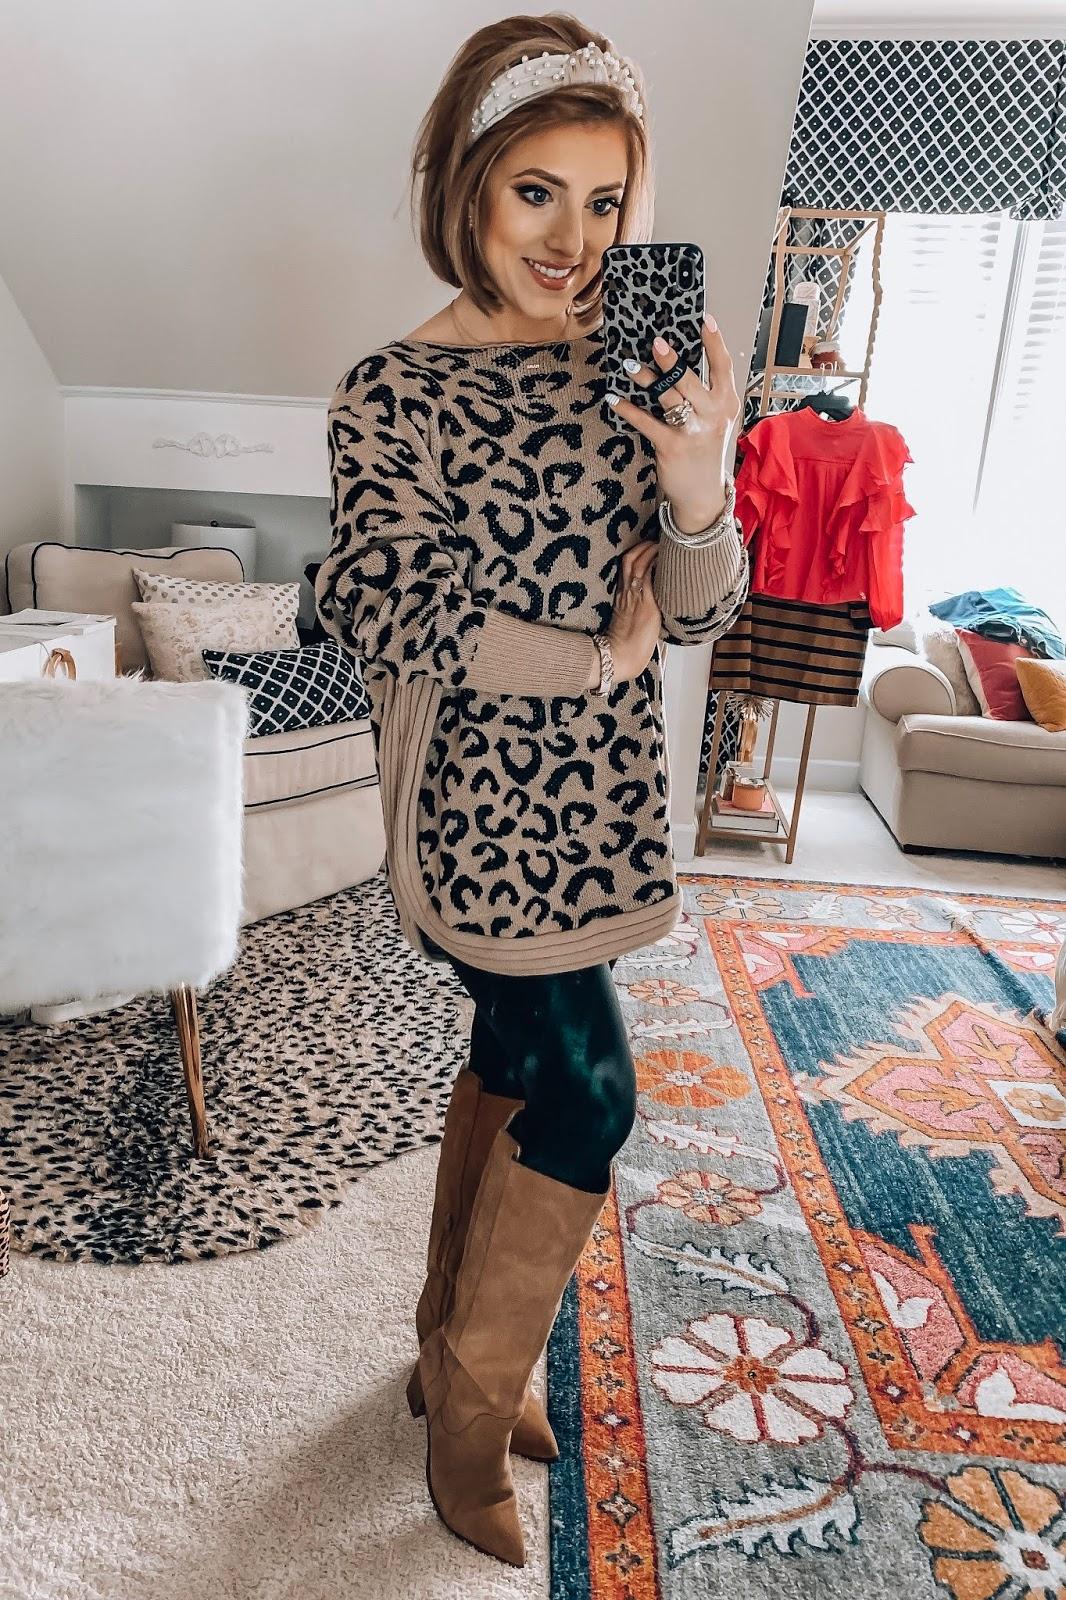 Recent Amazon Finds - Transitional Sweaters, Spring Transition Pieces, Spring Pieces, Swimsuits and More - Something Delightful Blog  #AmazonFinds #AmazonFasion #AffordableFashion #Spring2020